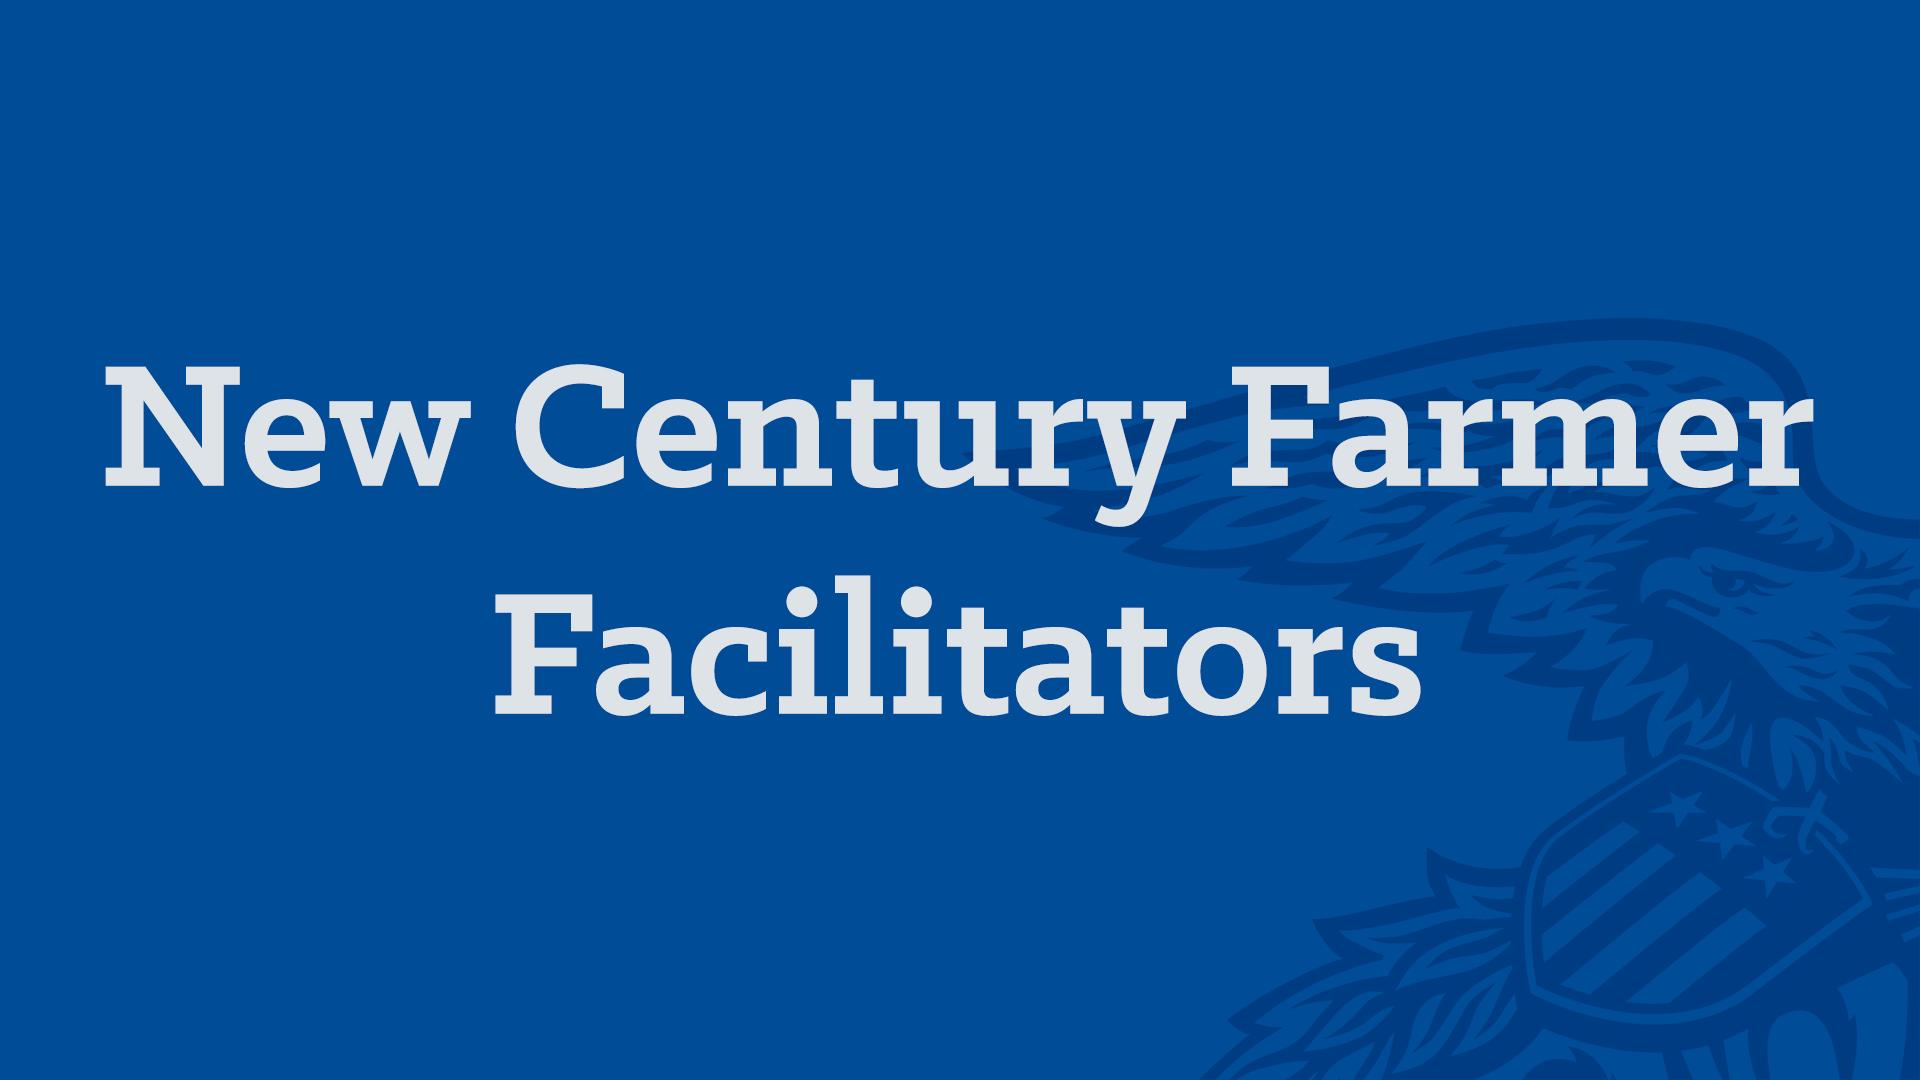 New Century Farmer Facilitators